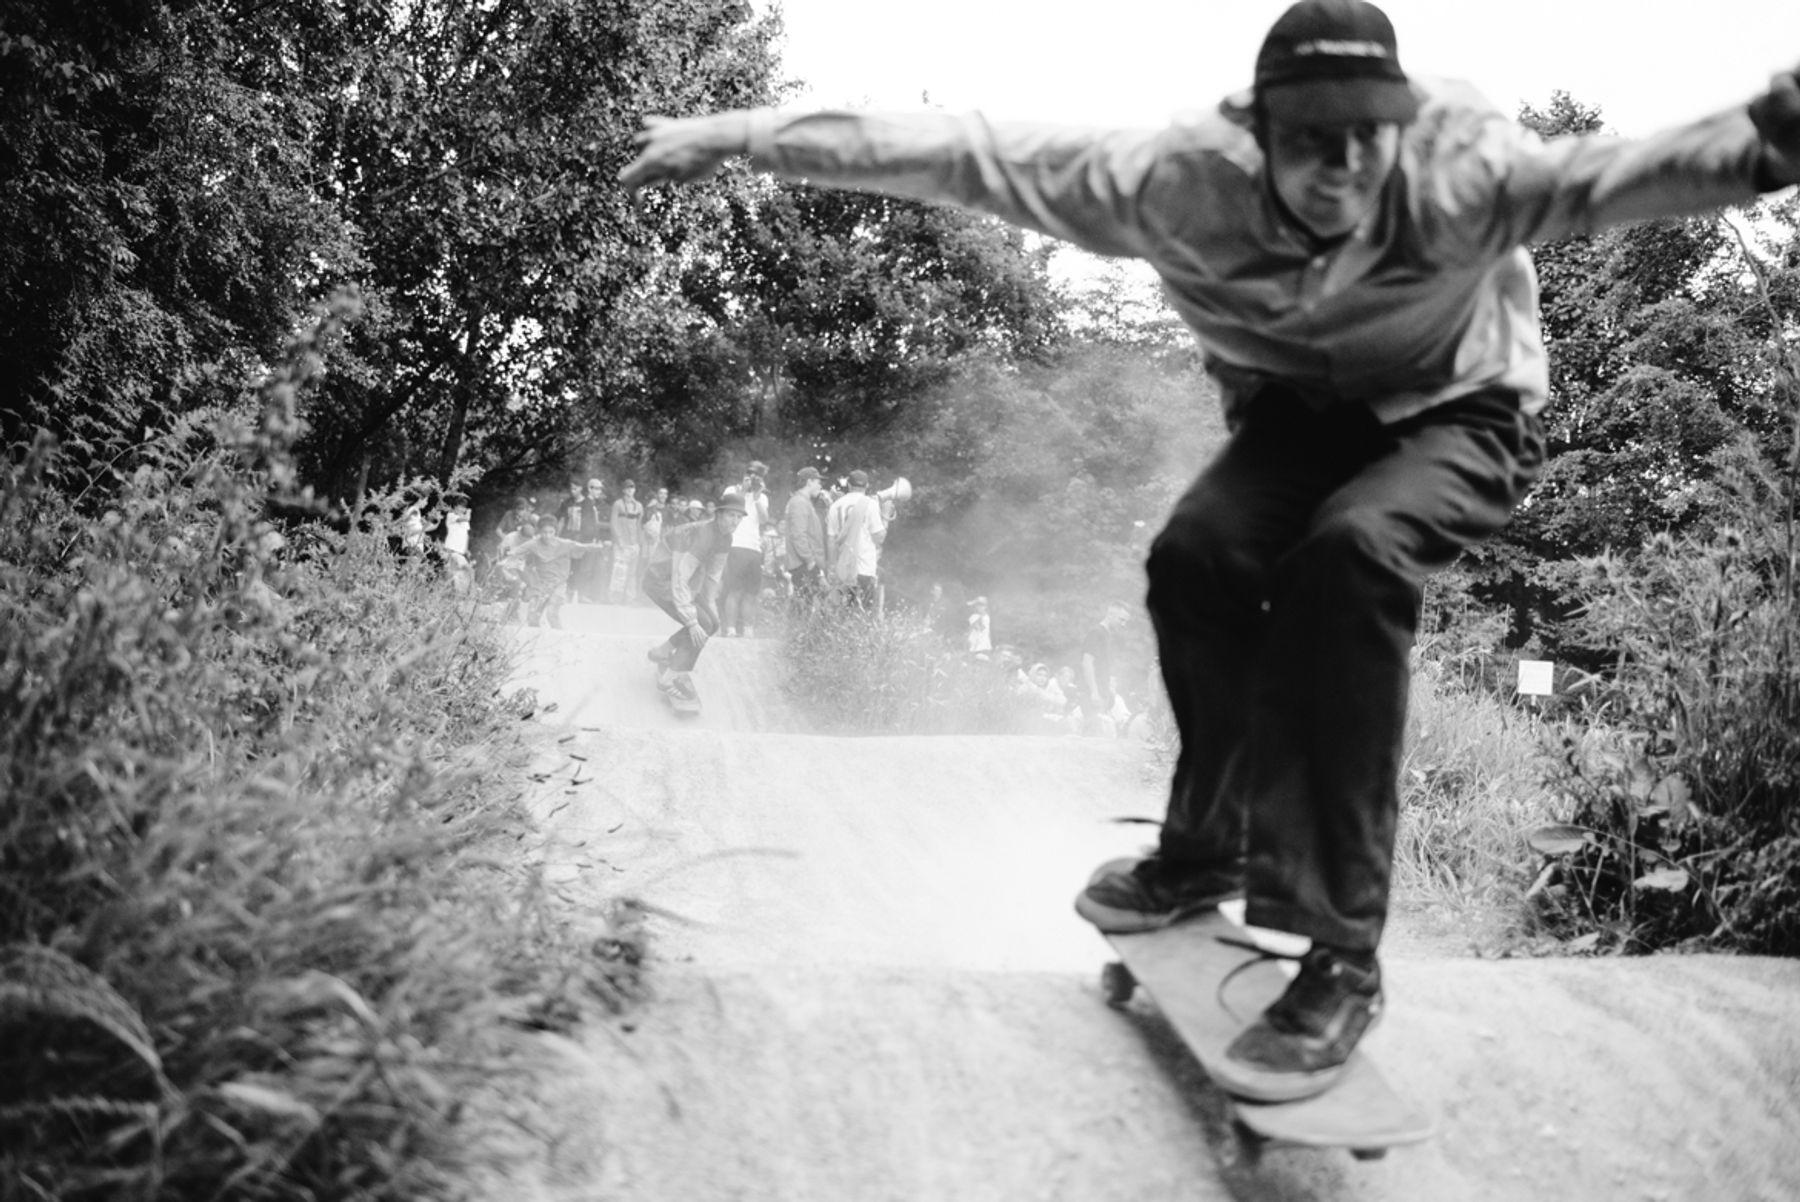 _IHC7789e-Nike-SB-x-Slam-City-Skates-Go-Skateboarding-Day-London-June-2015-Photographer-Maksim-Kalanep